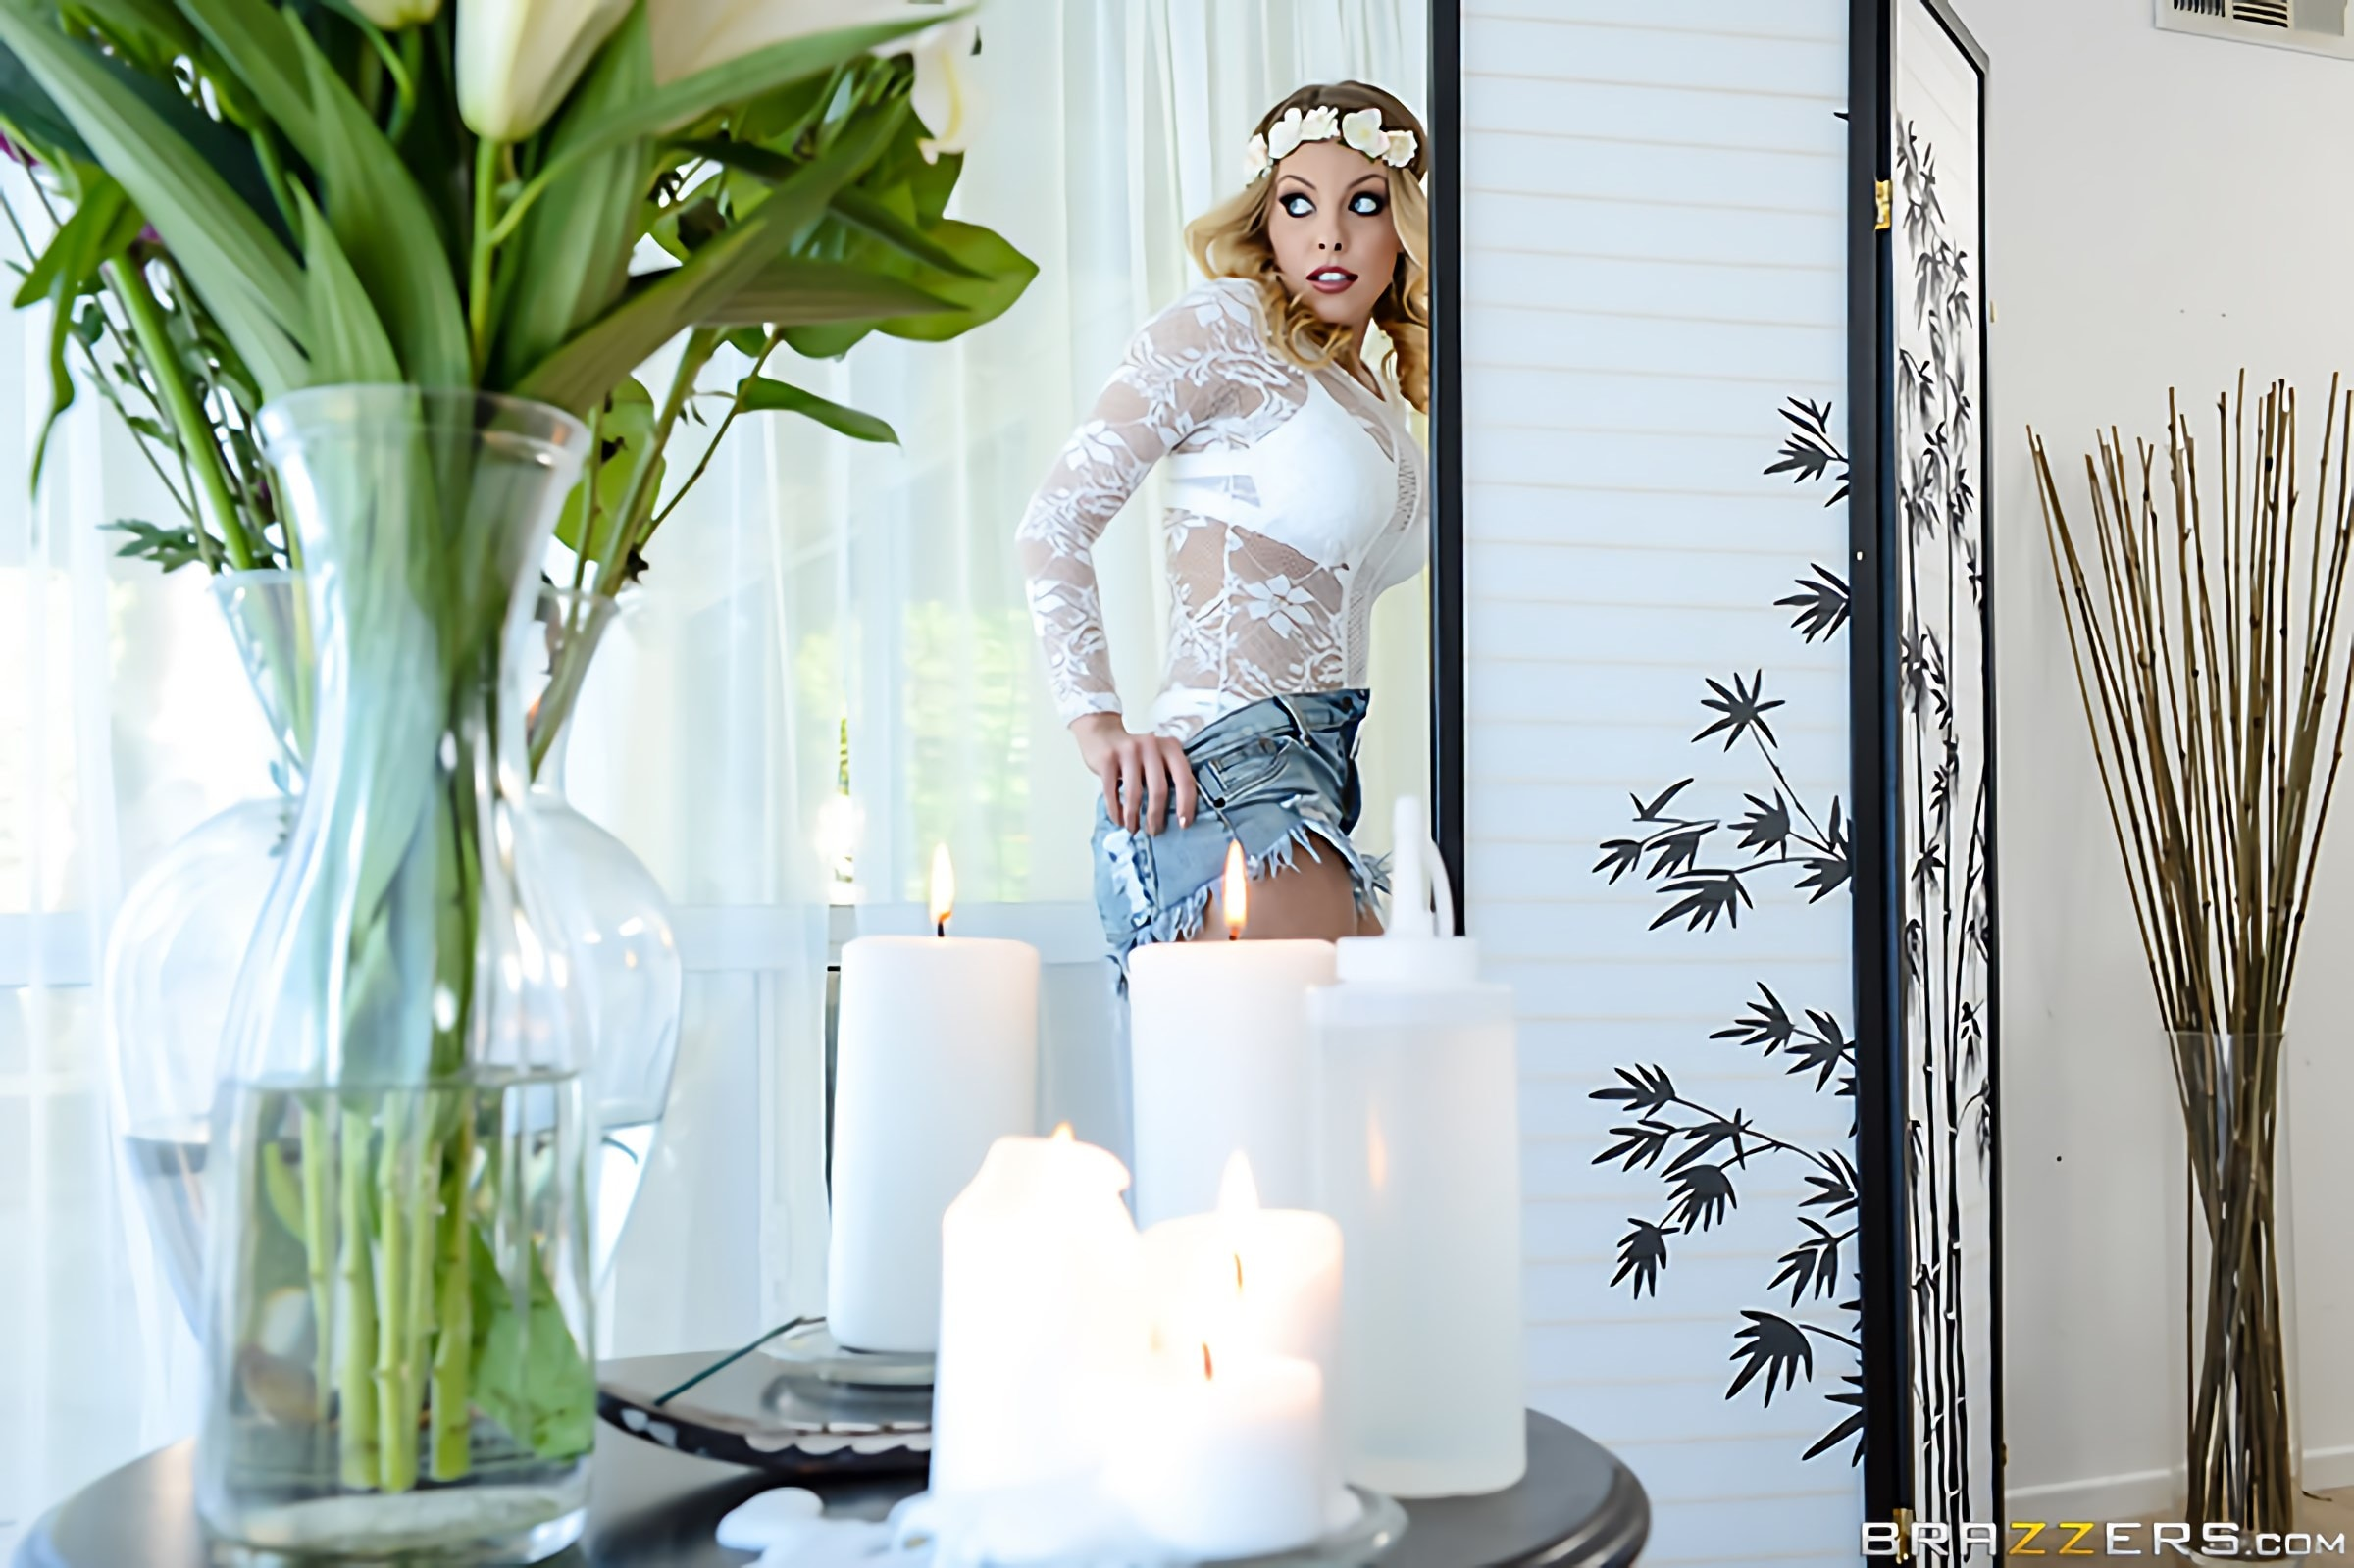 Brazzers 'Holistic Healing' starring Britney Amber (Photo 10)